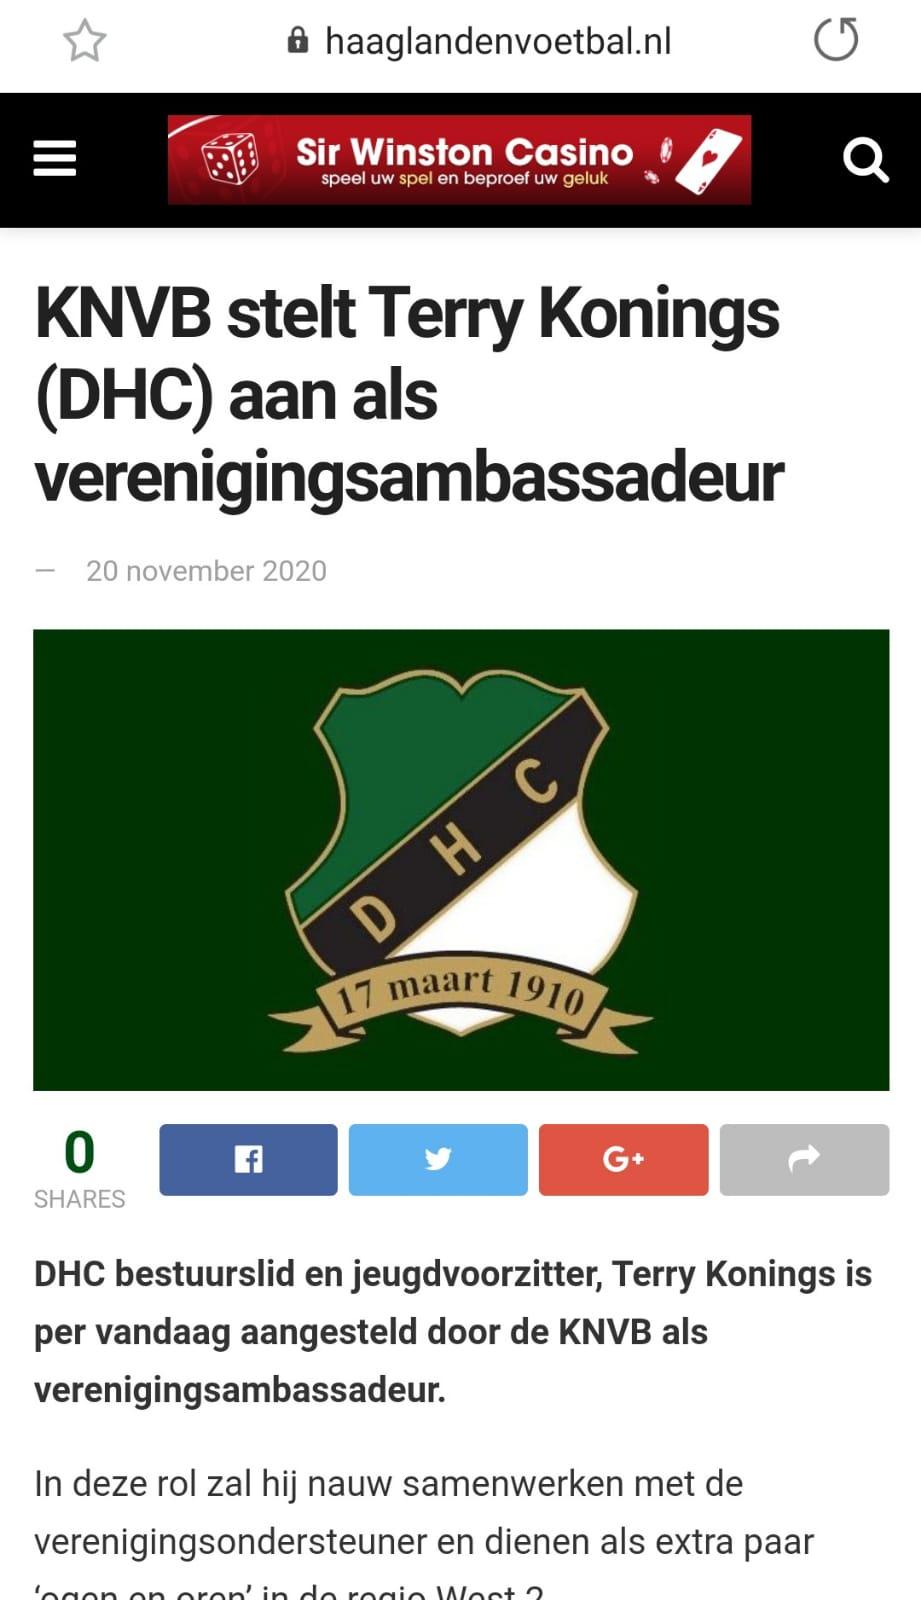 Haaglanden voetbal terry konings